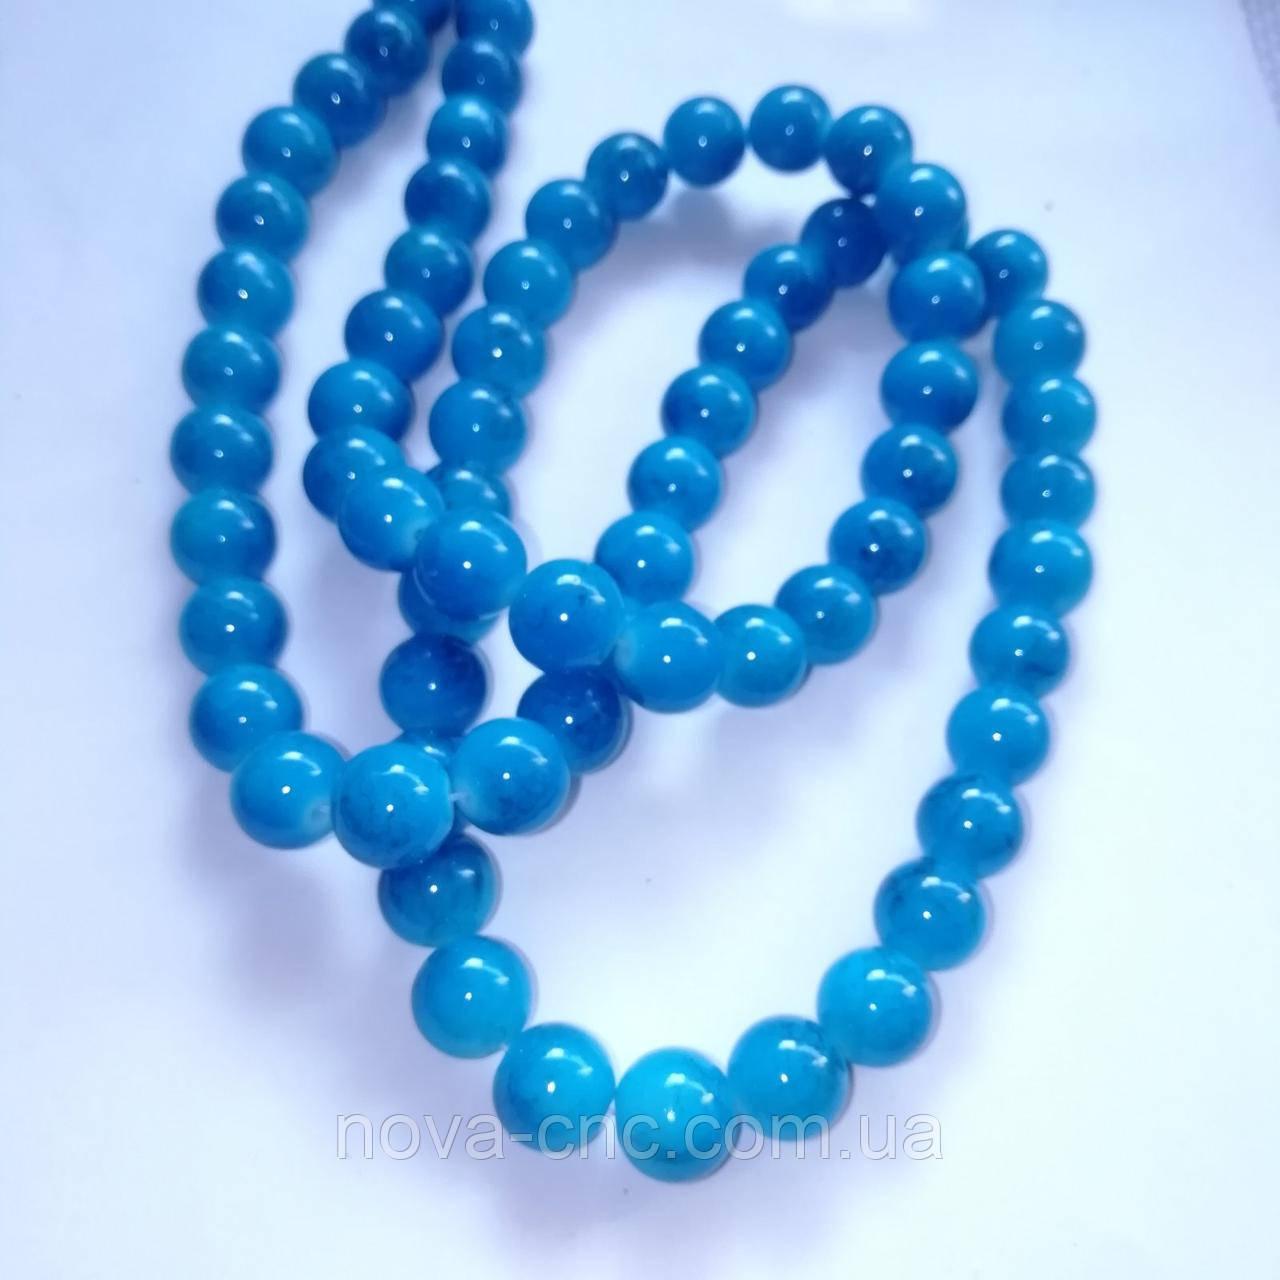 Бусины керамические диаметр 12 мм на леске 68 бусин ярко-голубой мрамор